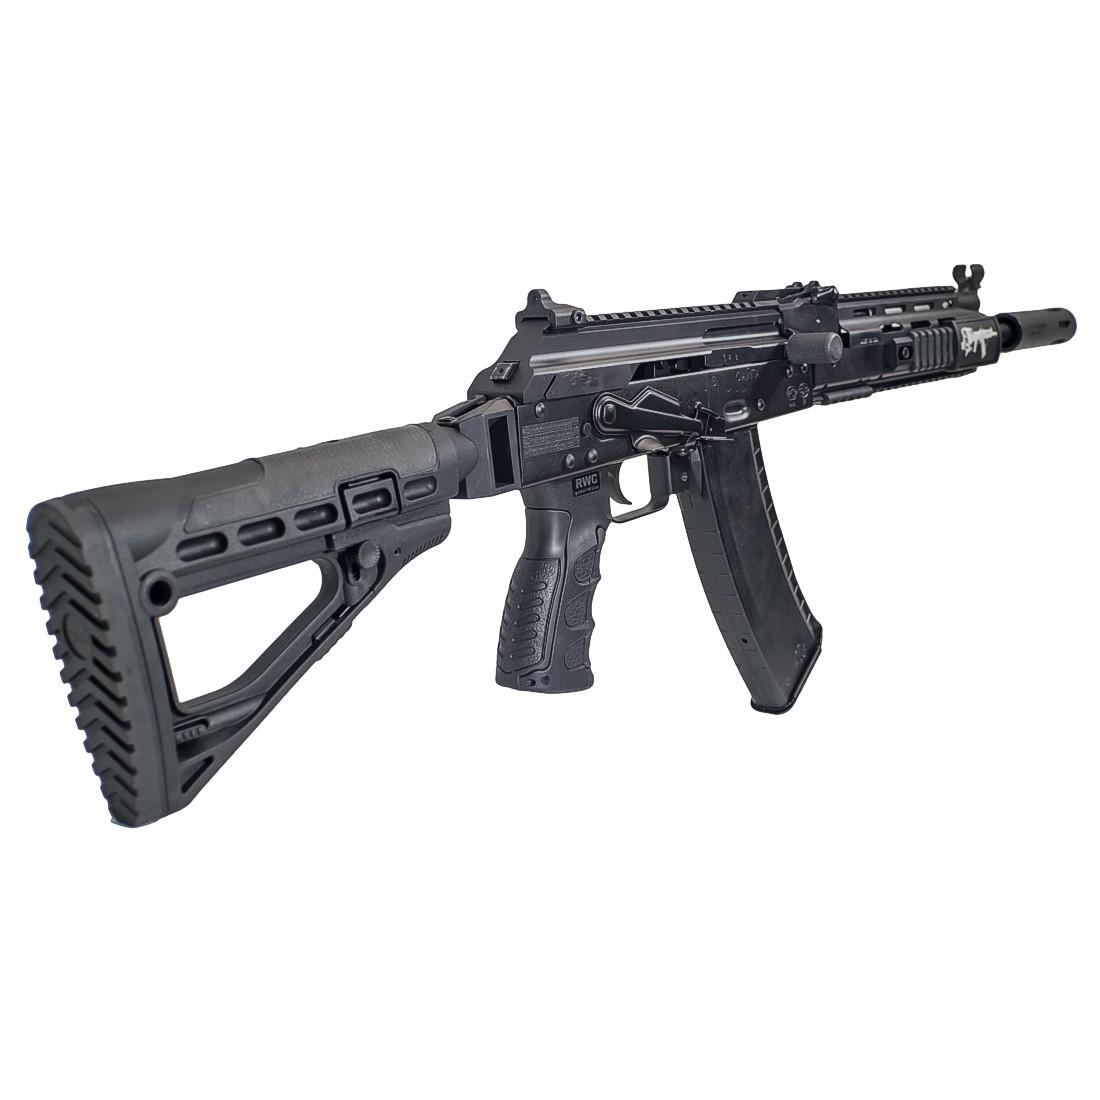 "TSS TSS Tactical AK -74 5.45×39 ""Operator"" SAIGA based"